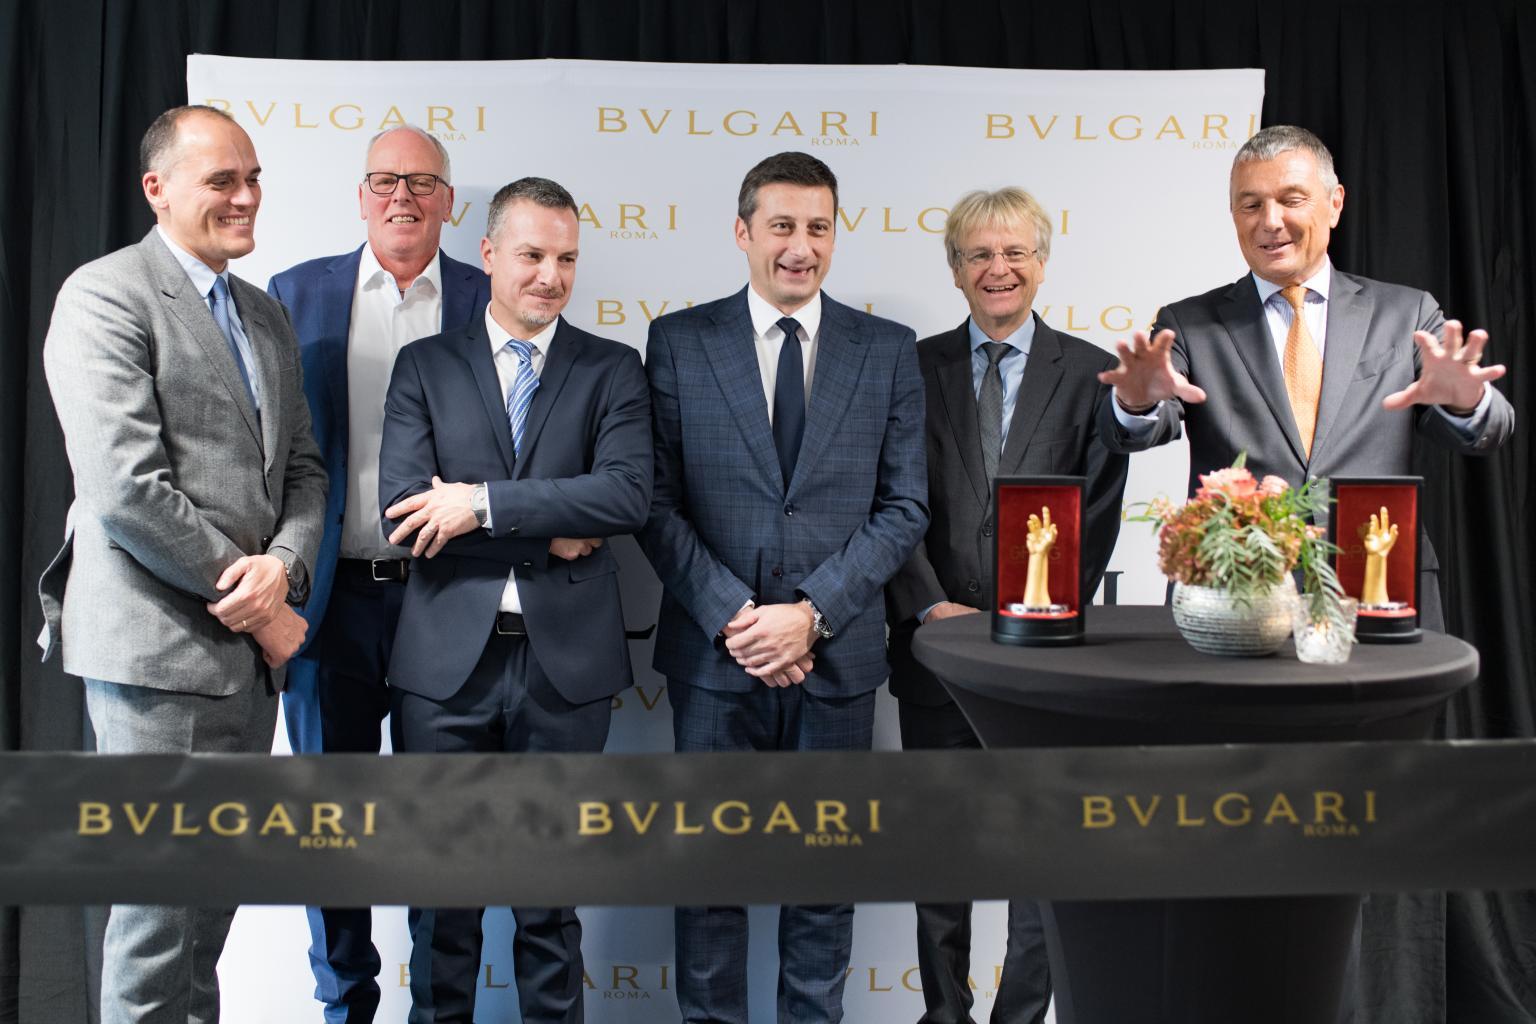 Bulgari opens 'Habillage Workshop' in Saignelegier, Jura (Switzerland)